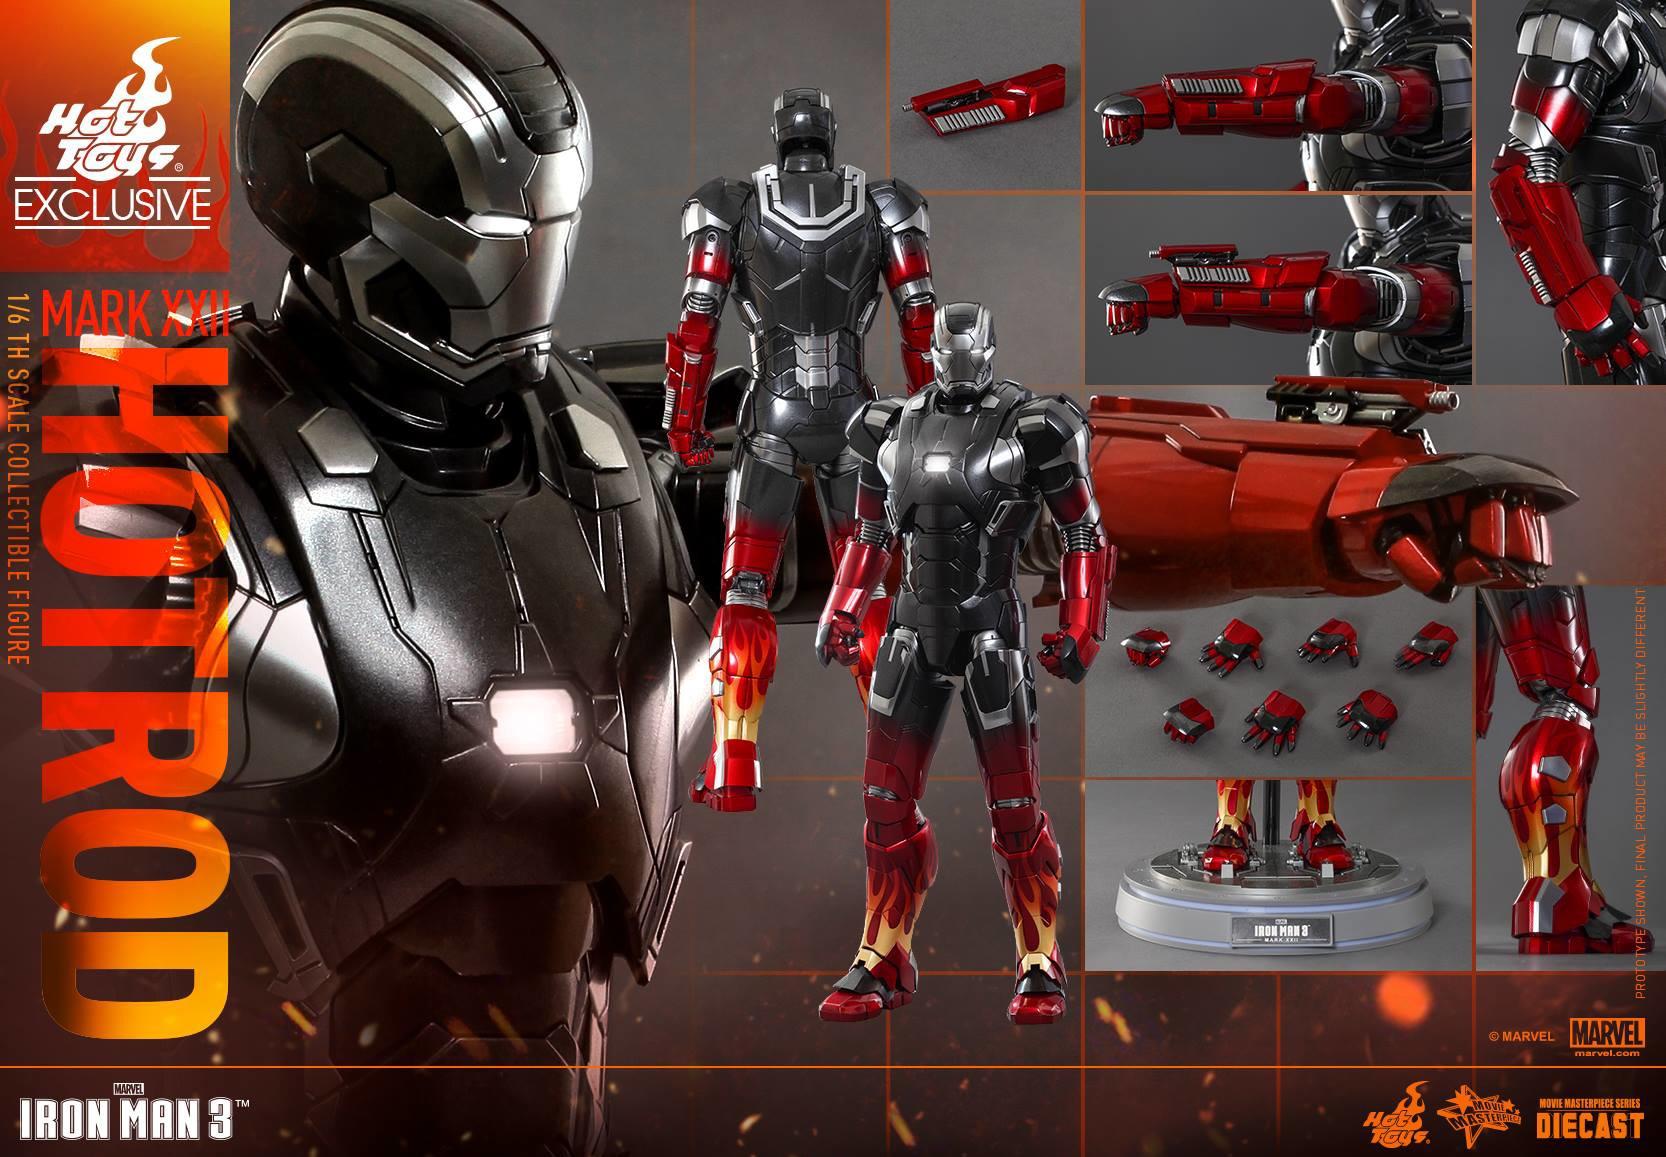 HOT TOYS Iron Man Hot Rod